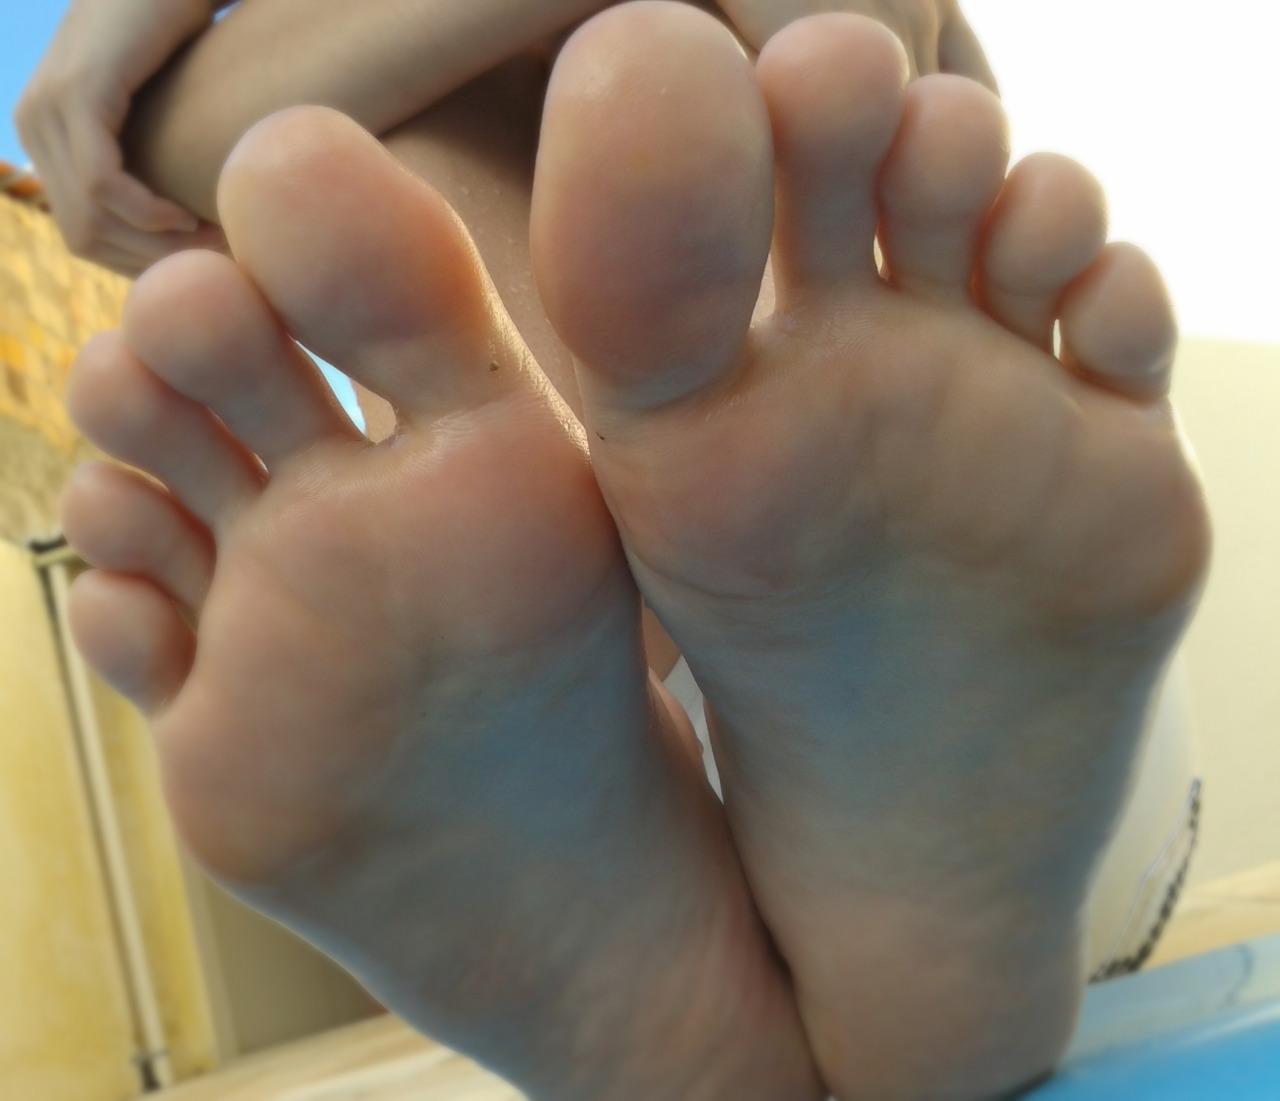 Exclusif pieds sexy XXX Porno 25